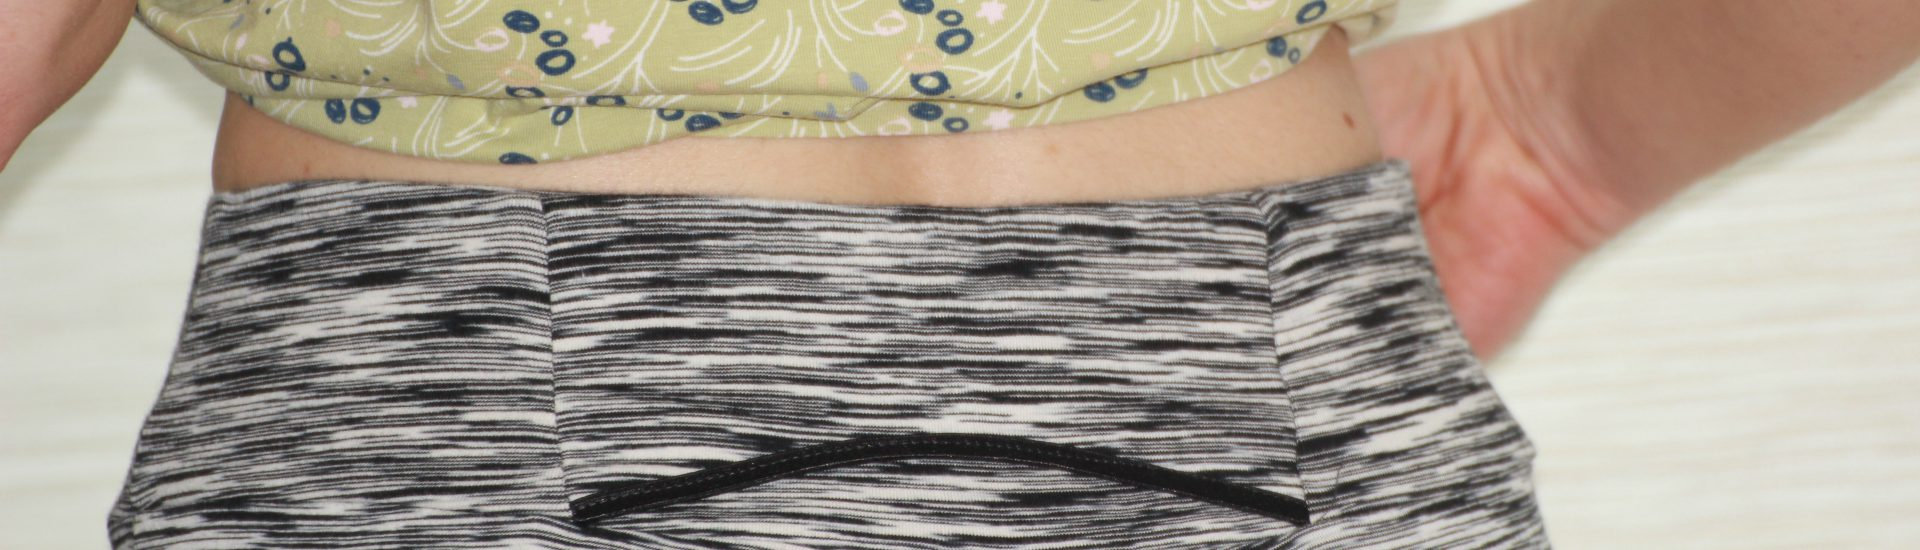 Fehr Trade Yoga Pants